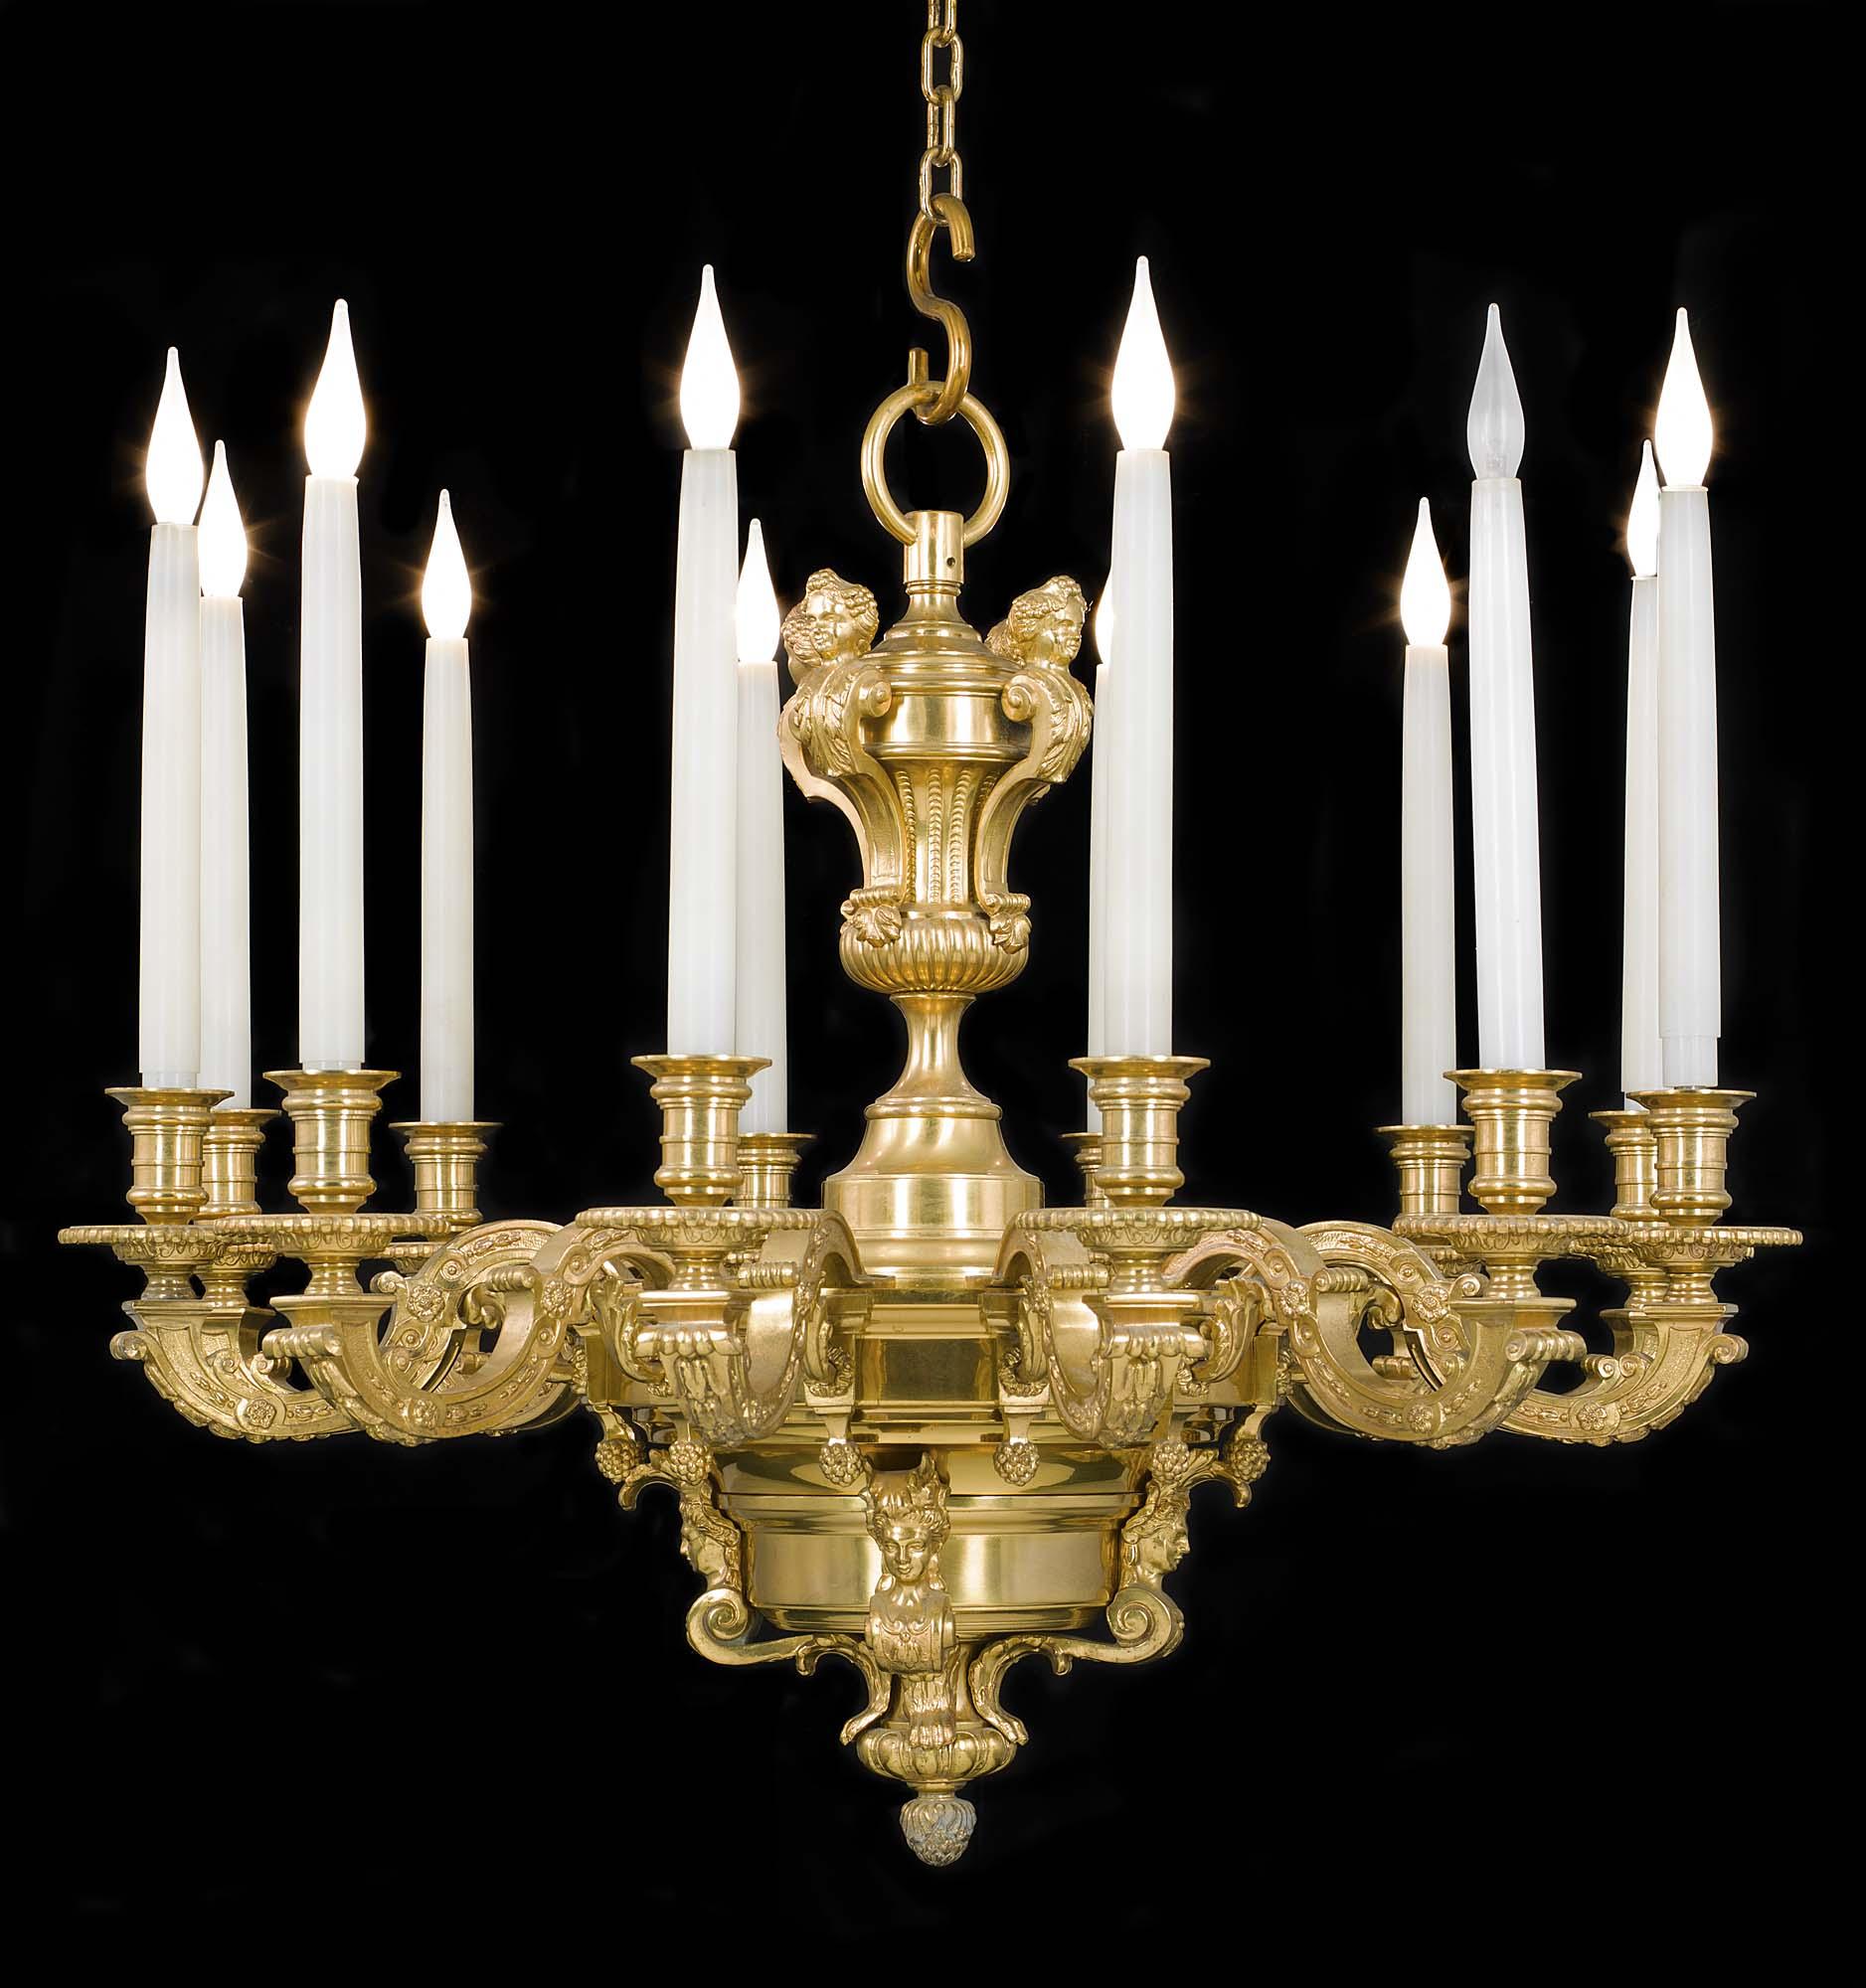 Baroque gilt brass victorian chandelier westland london ornate gilt brass baroque style victorian antique chandelier mozeypictures Choice Image